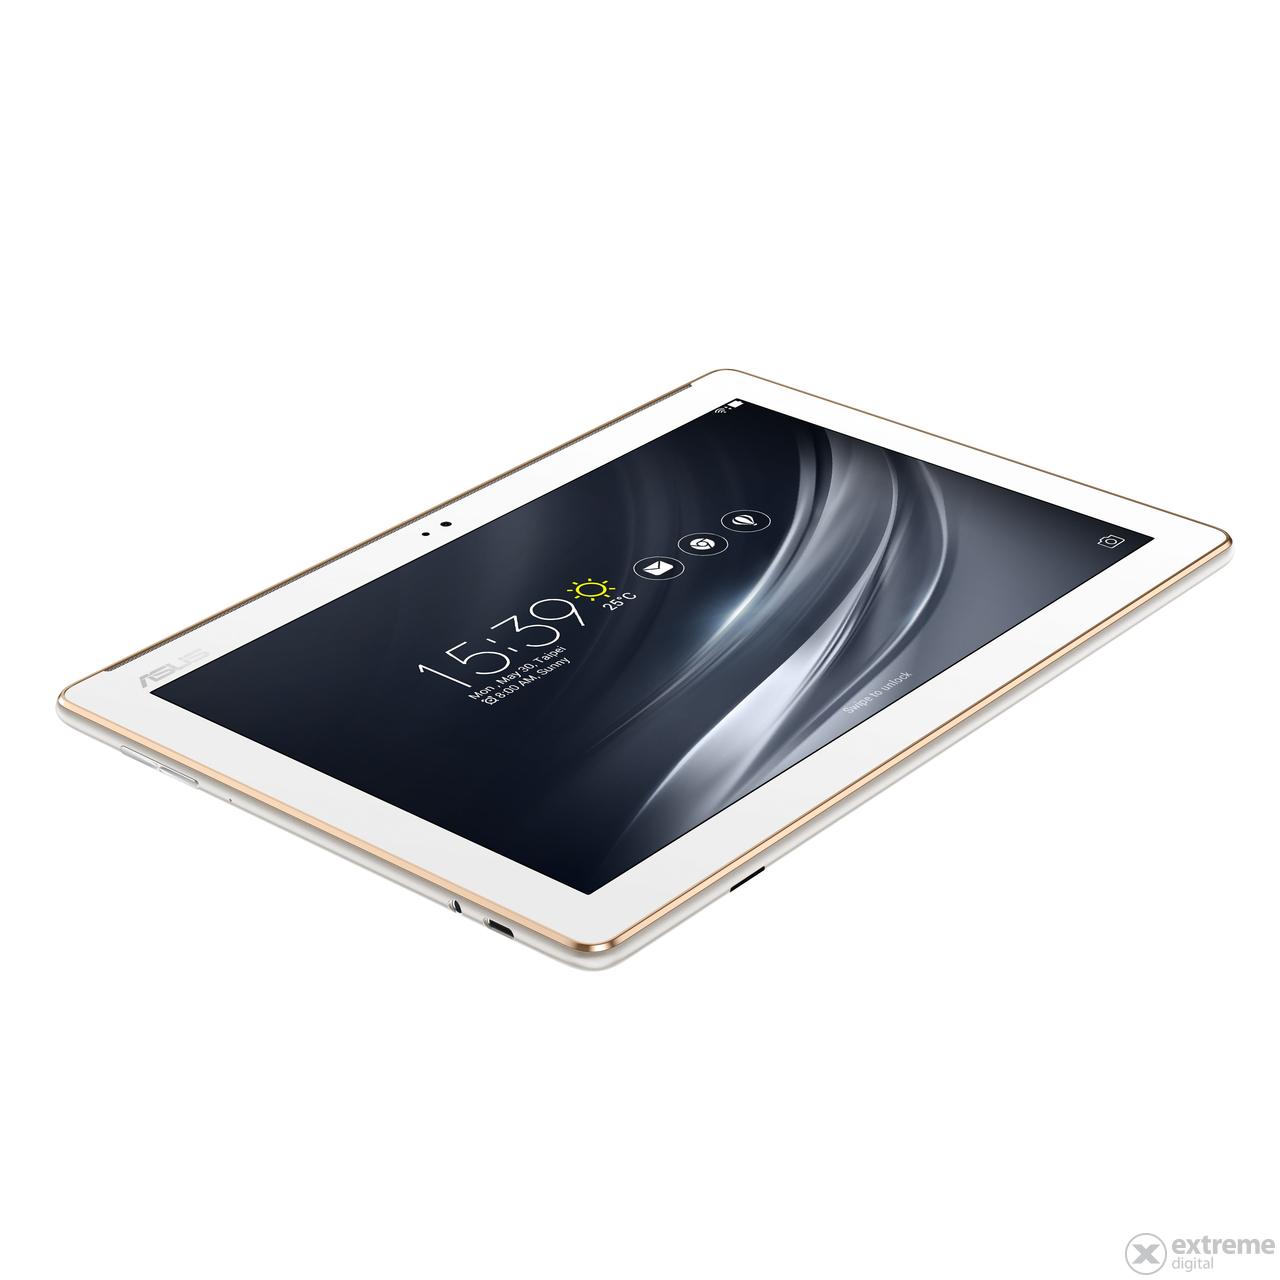 asus zenpad z301m 1b013a 10 1 16gb wifi tablet extreme digital. Black Bedroom Furniture Sets. Home Design Ideas